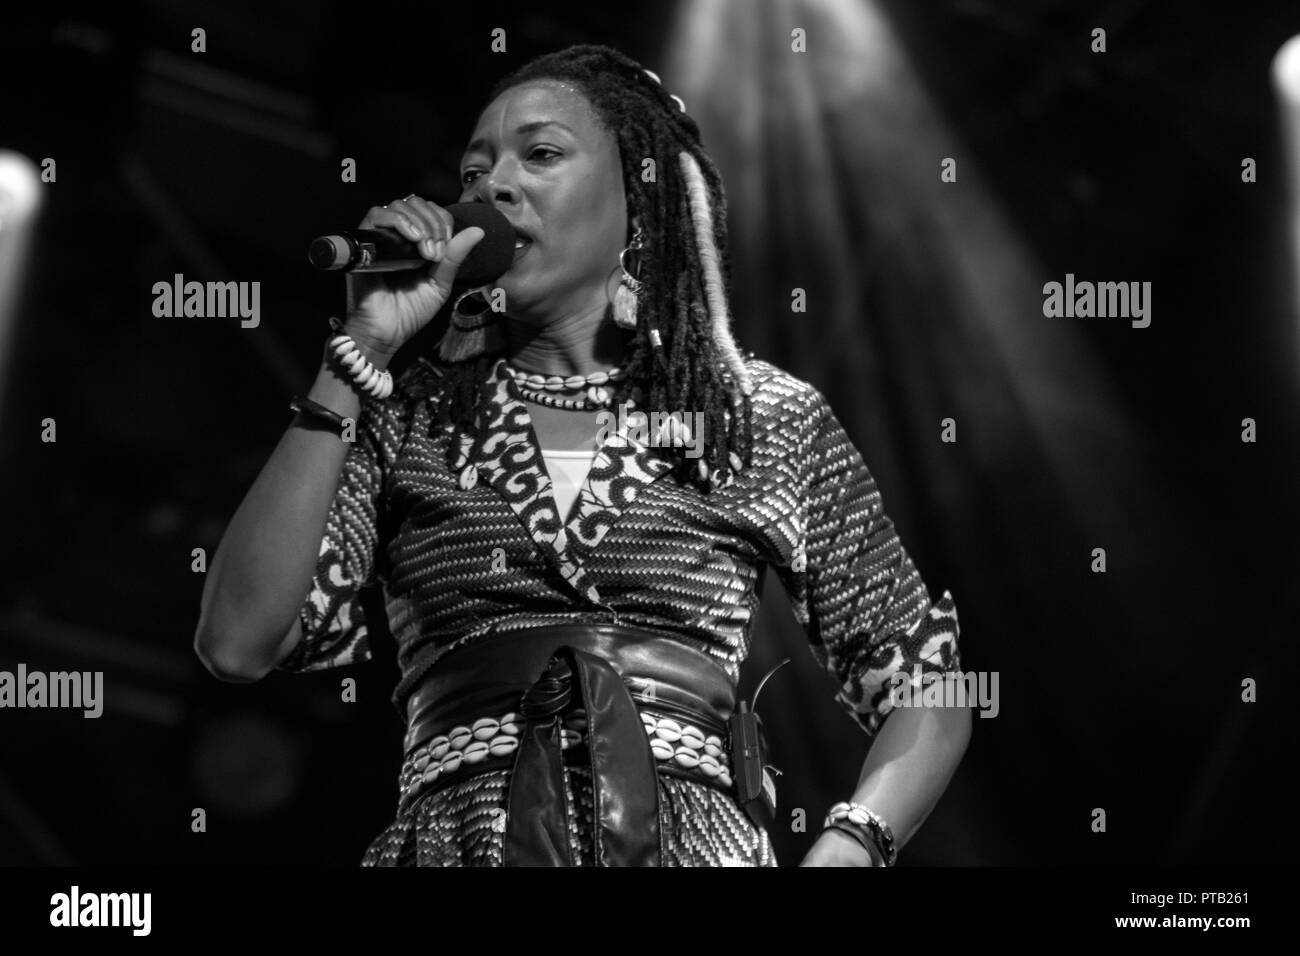 Malian singer and guitarist, Fatoumata Diawara, performing at George Square, Glasgow, Scotland, on 12th August, 2018, during Festival 2018 Stock Photo